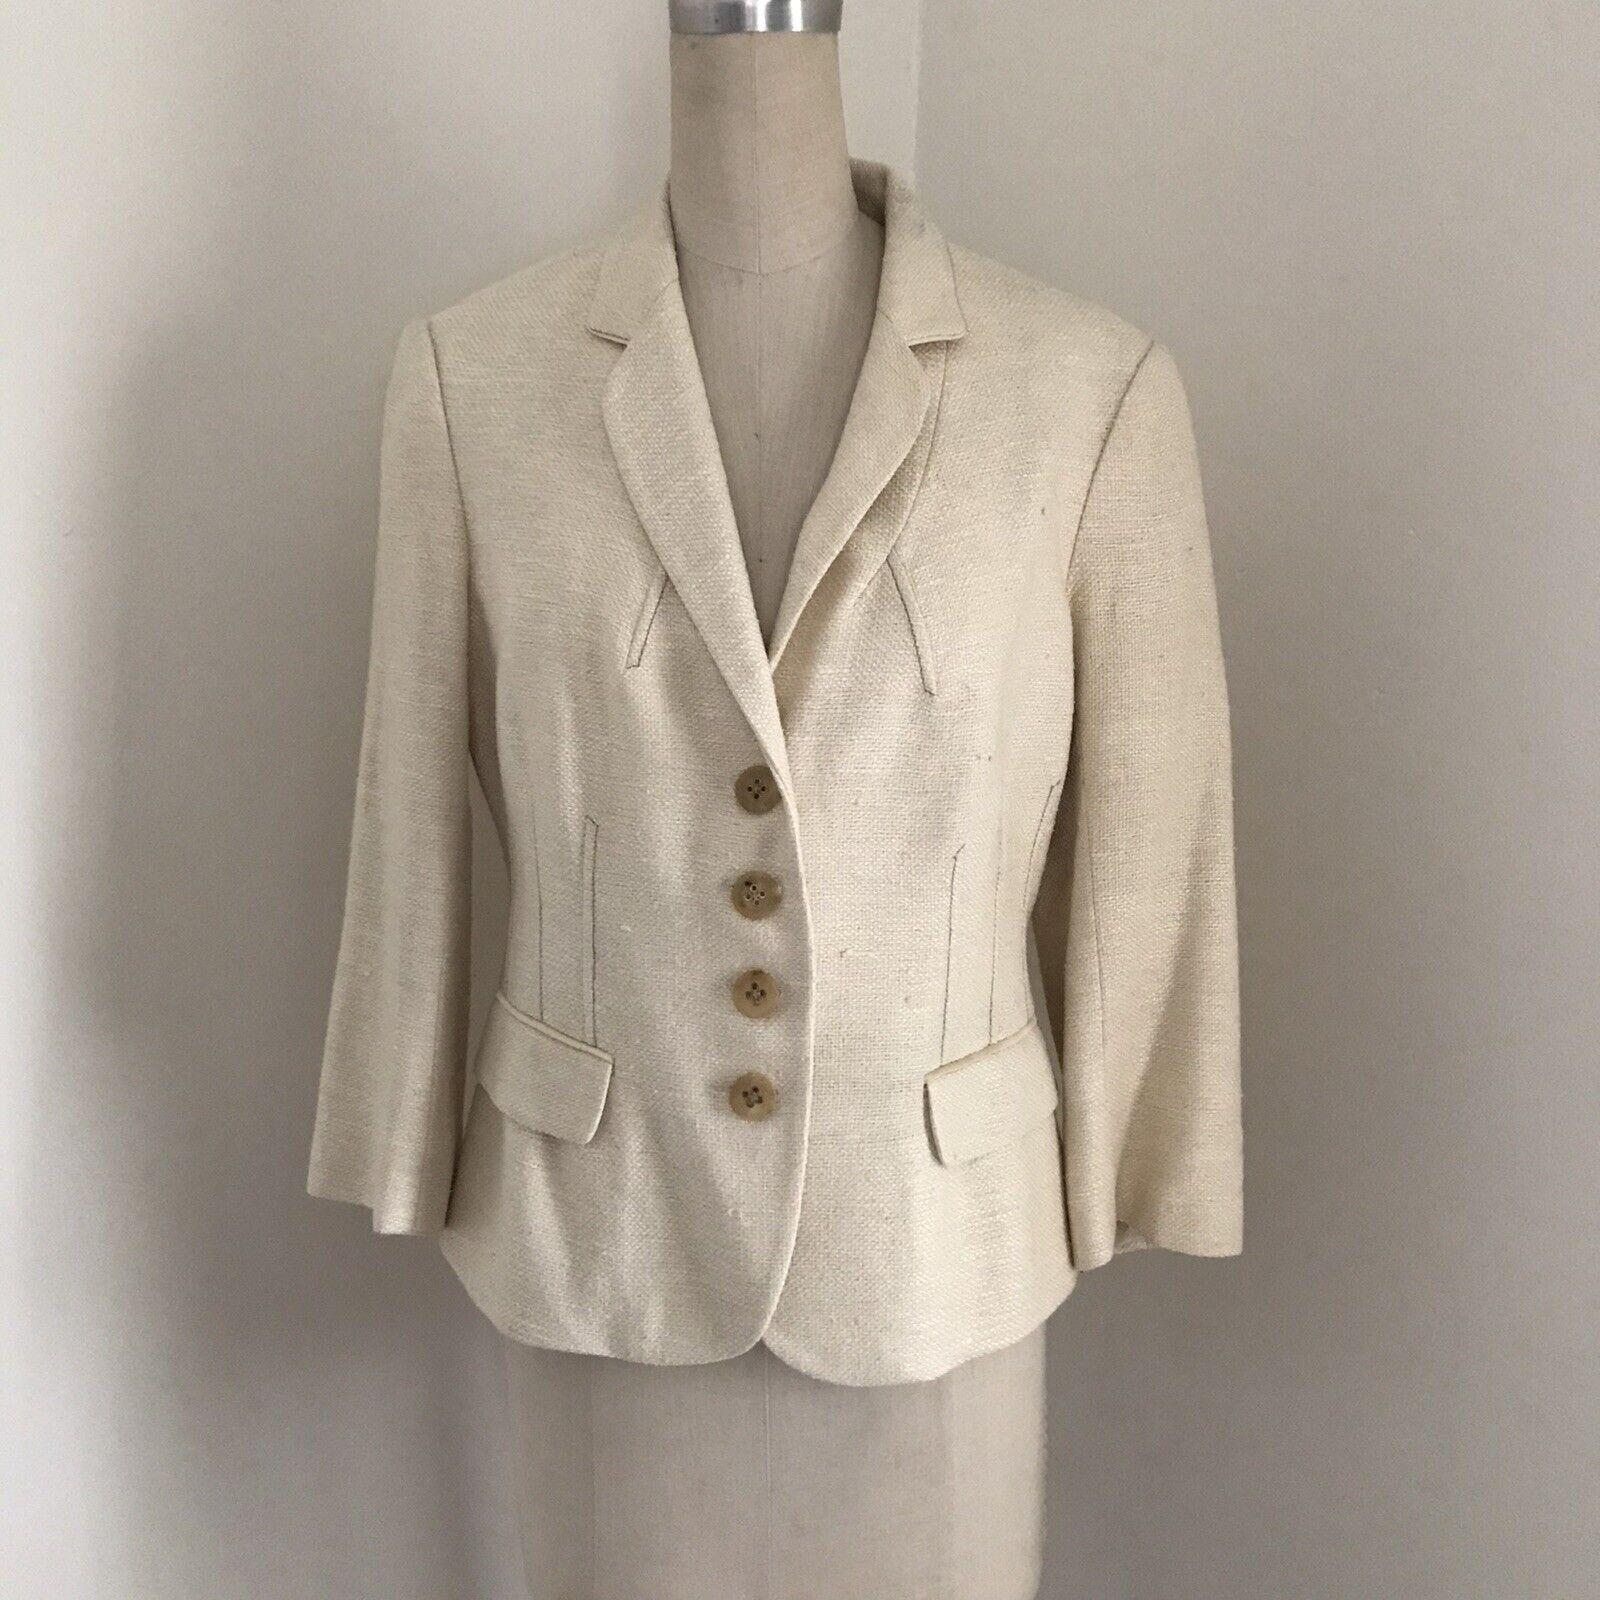 Badgley Mischka Women's Jacket Ivory Textured Woven 3/4 Sleeve 8